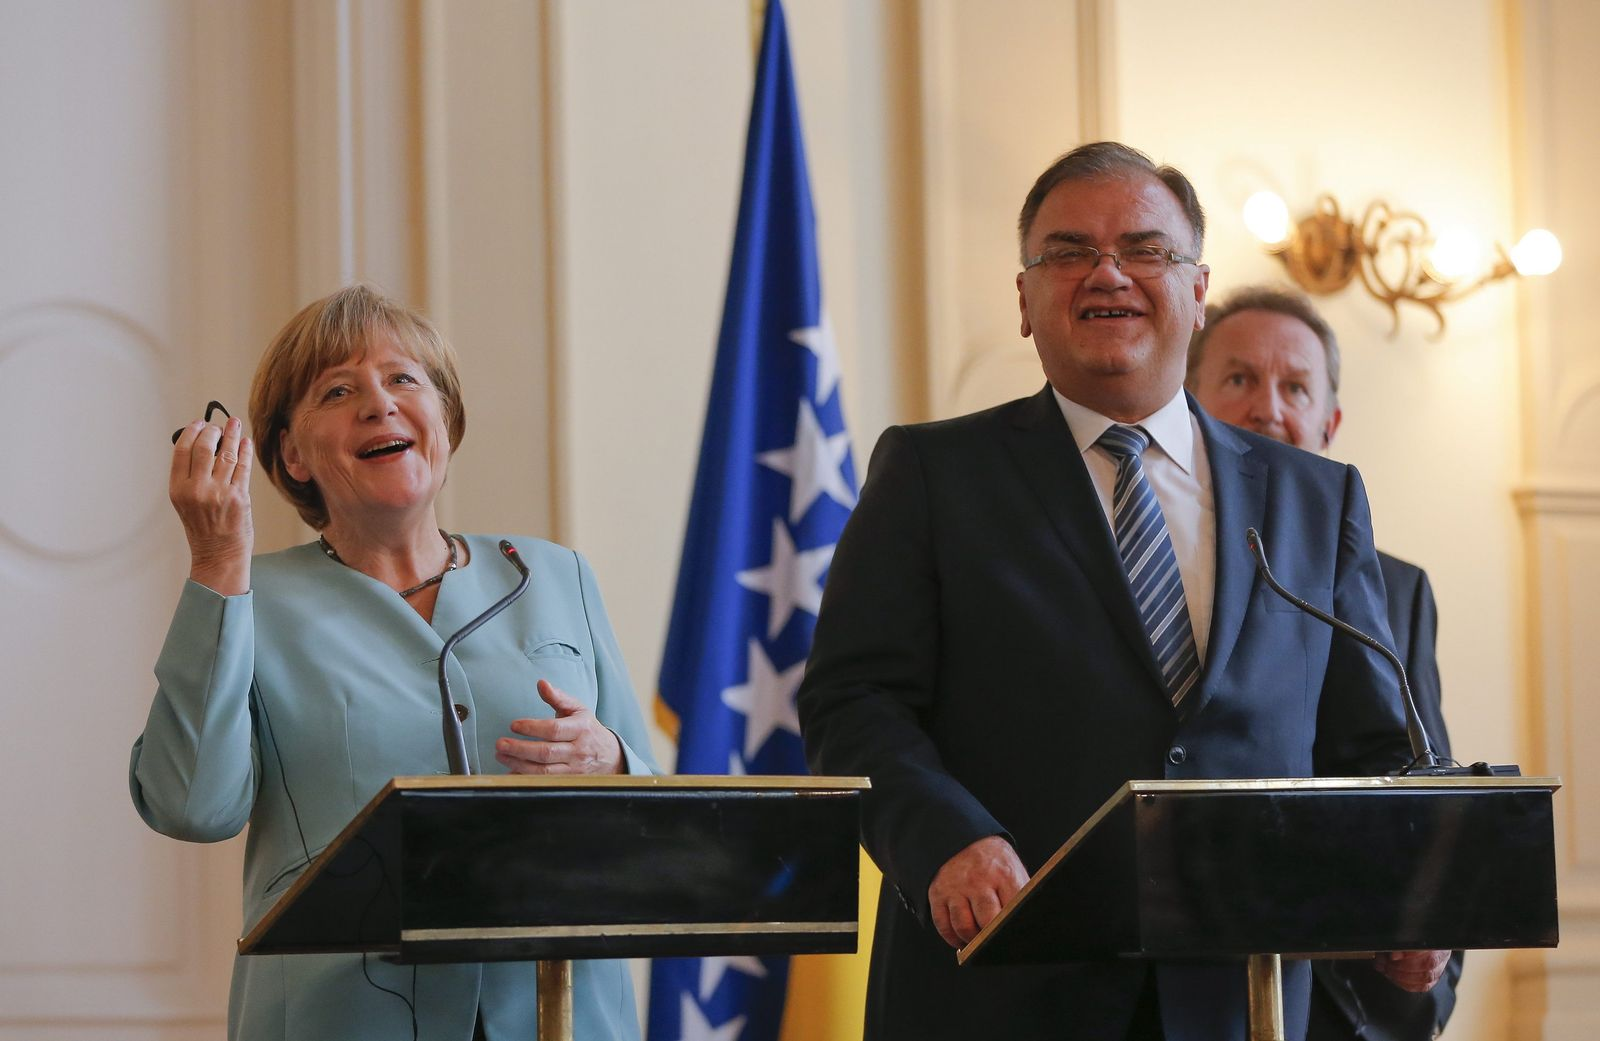 Angela Merkel/Mladen Ivanic